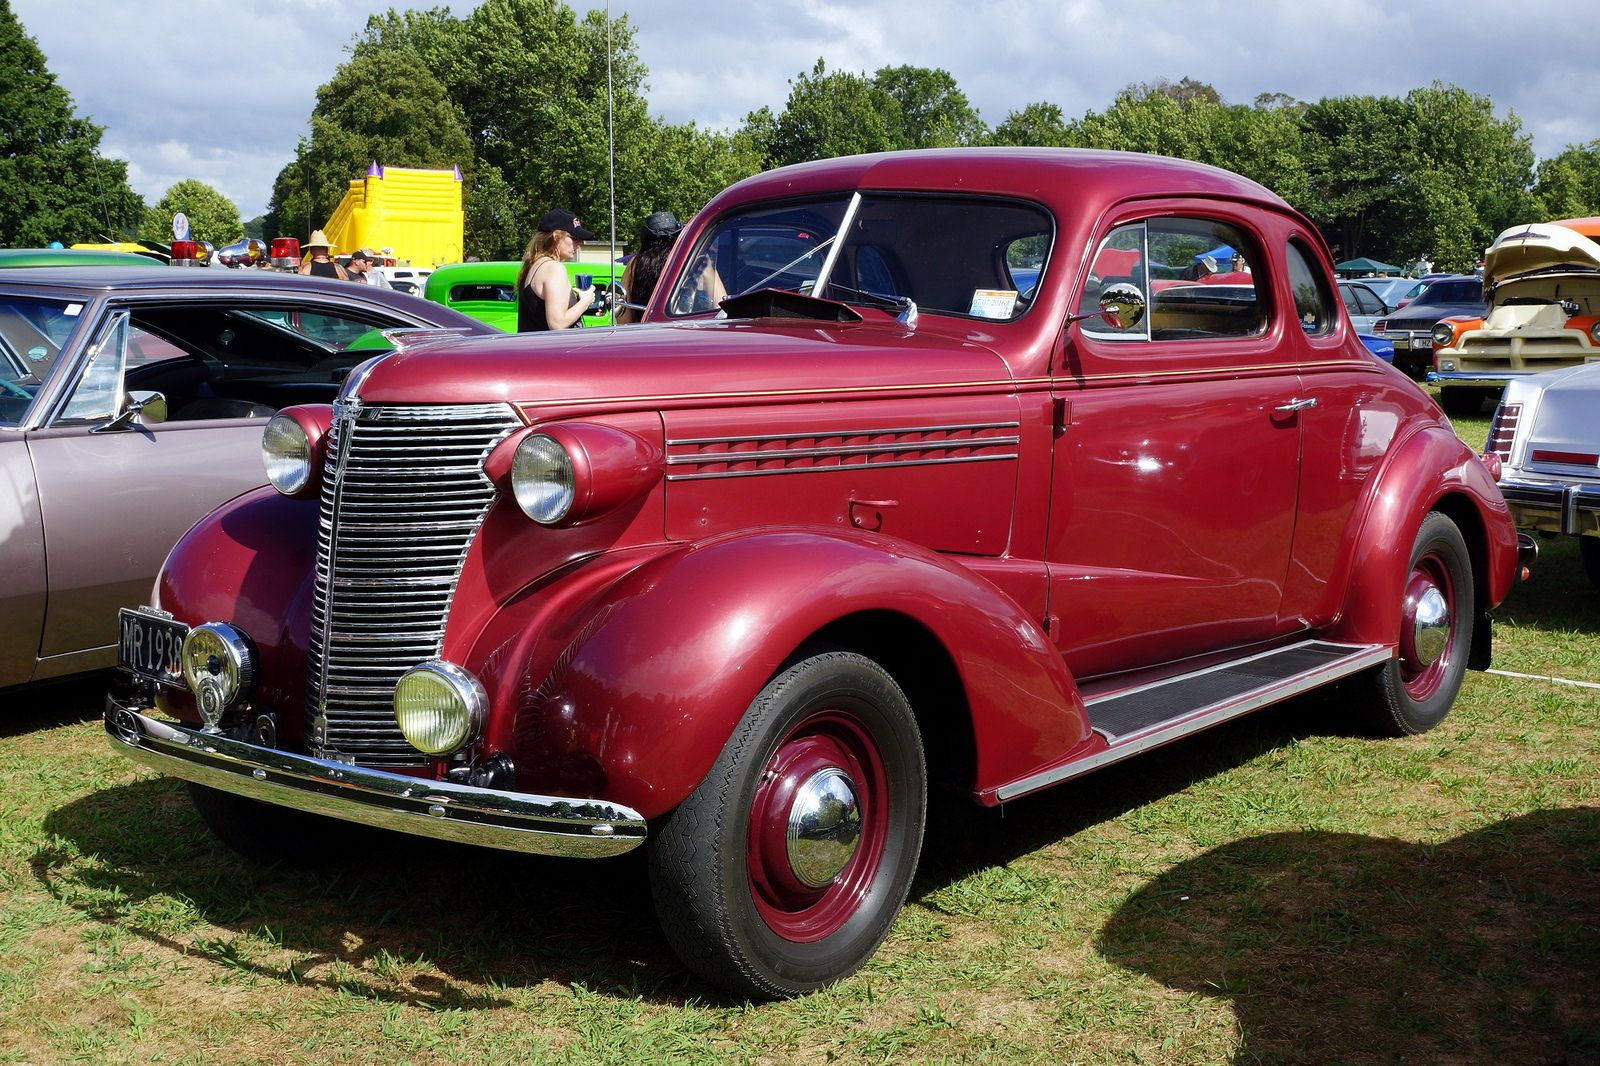 1938 Chevrolet Coupe Coches Clasicos Automoviles Autos